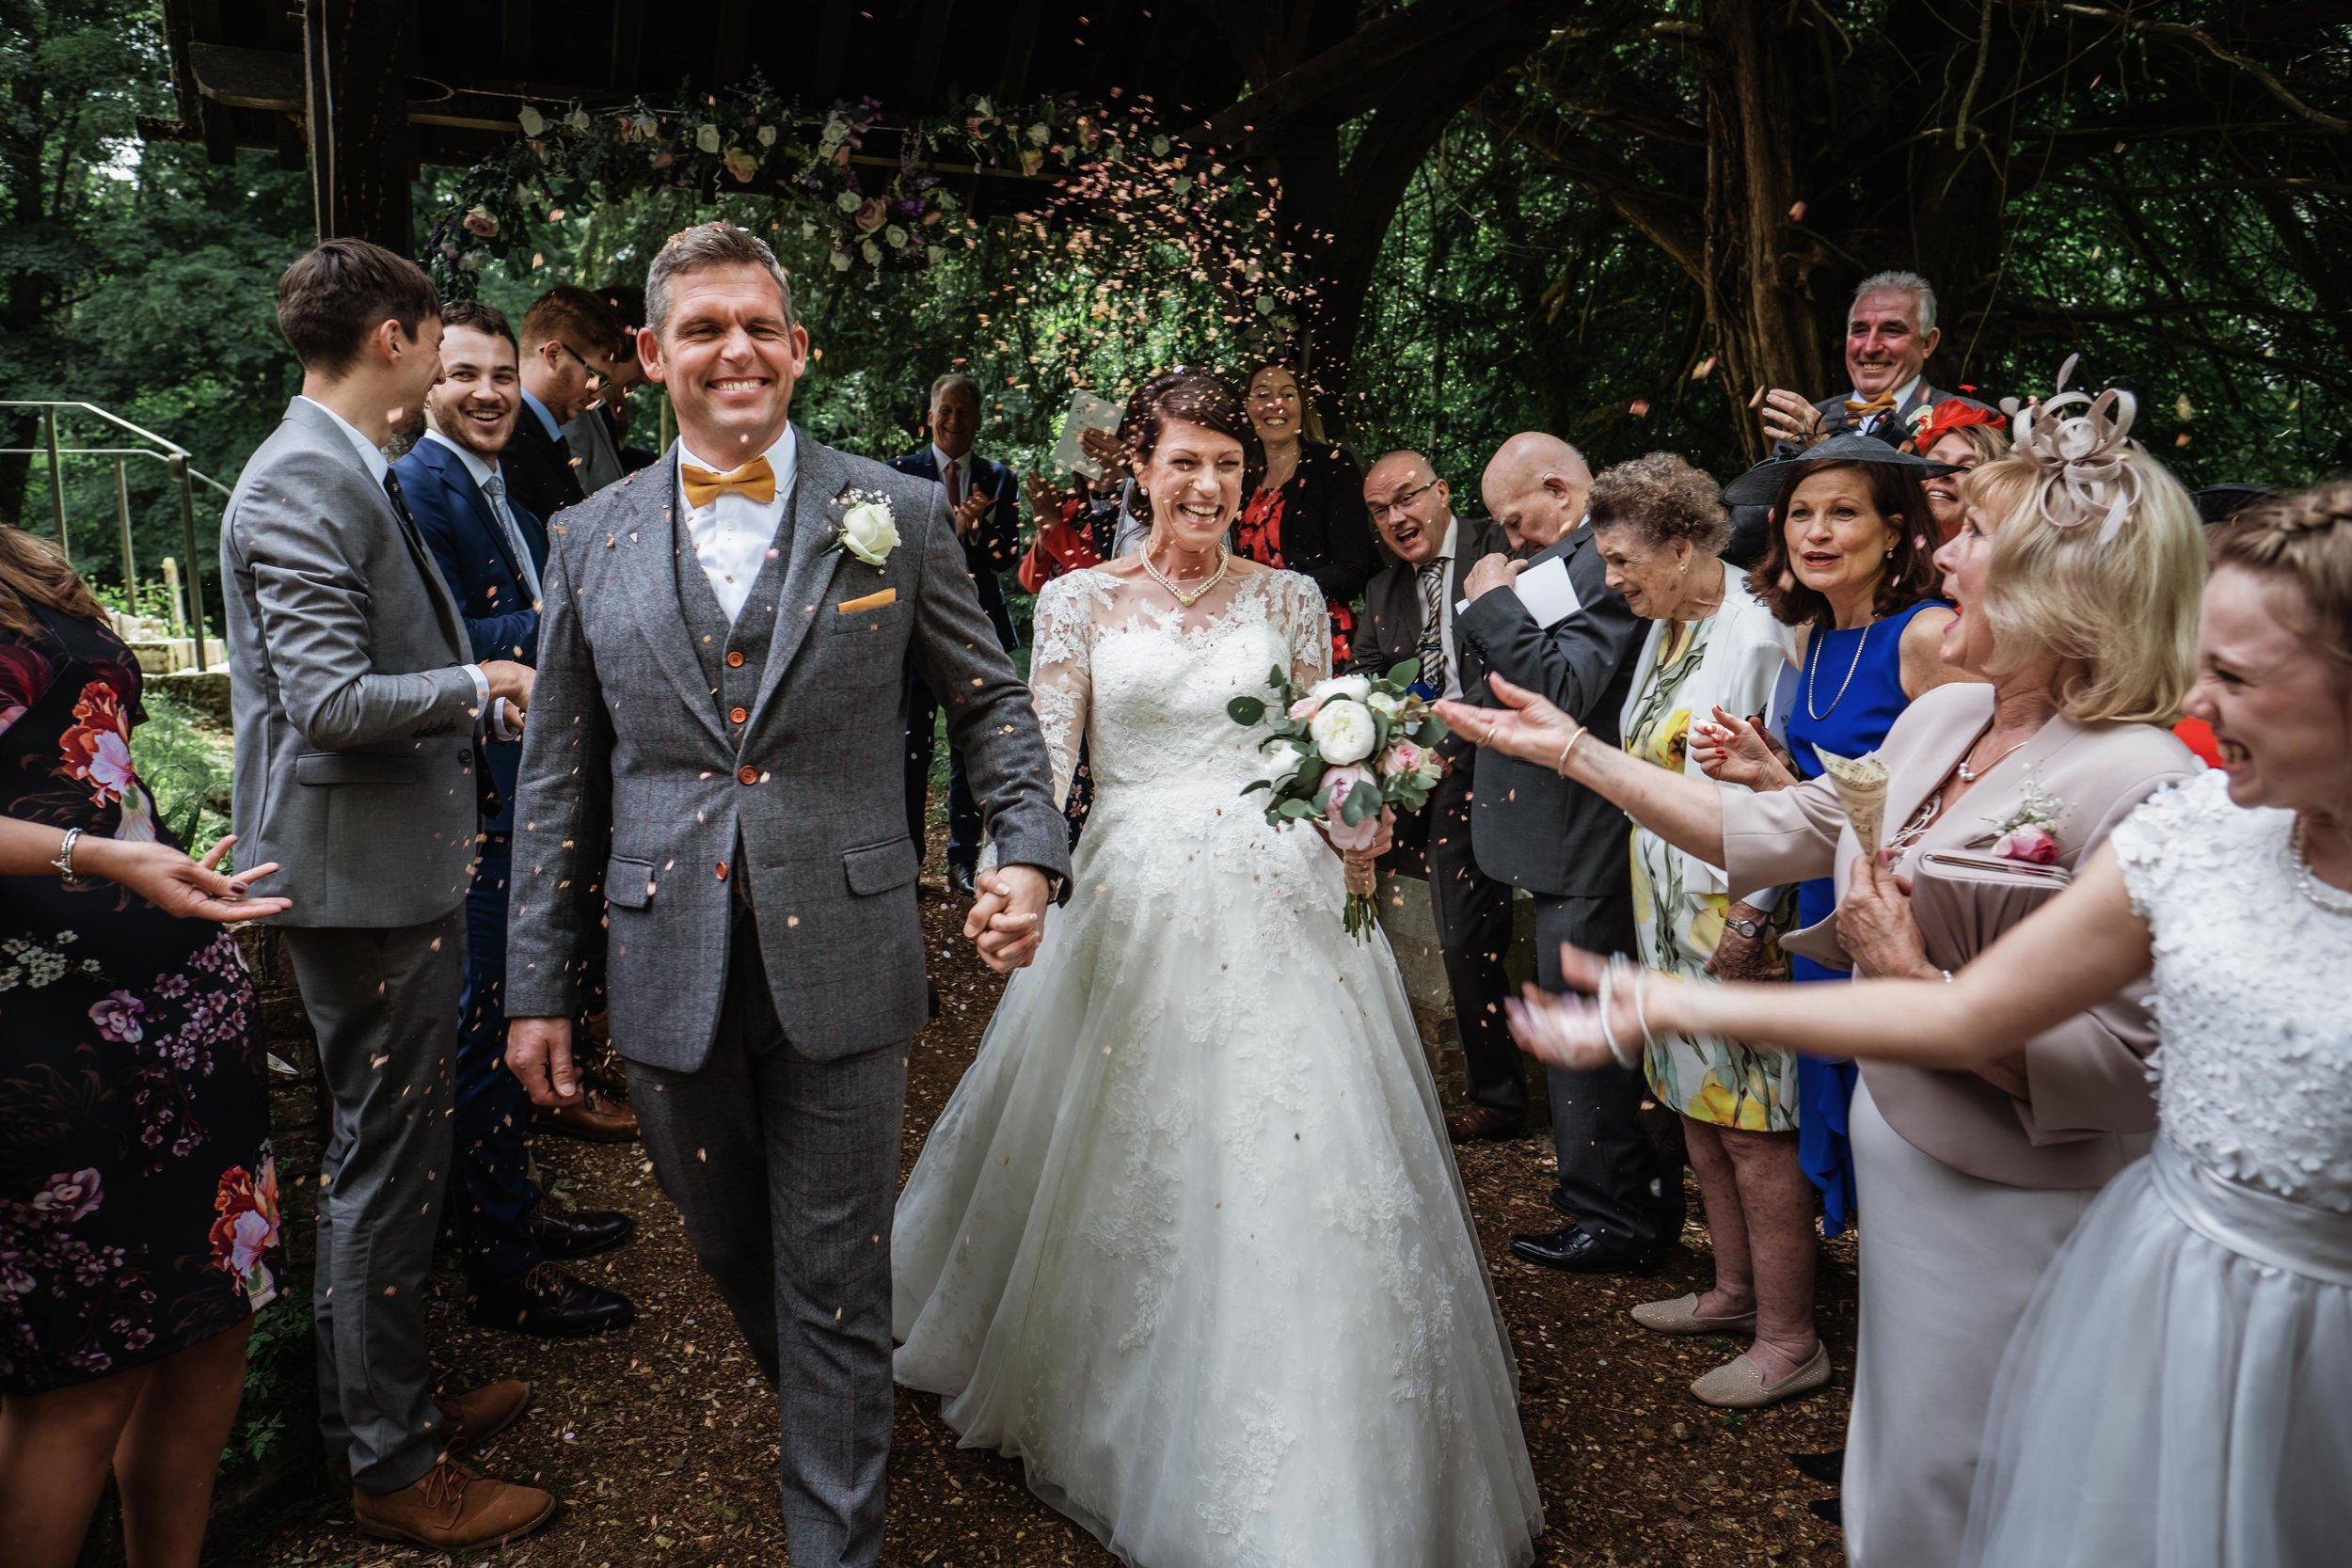 Barford Barn weddings (1 of 1)-6.jpg